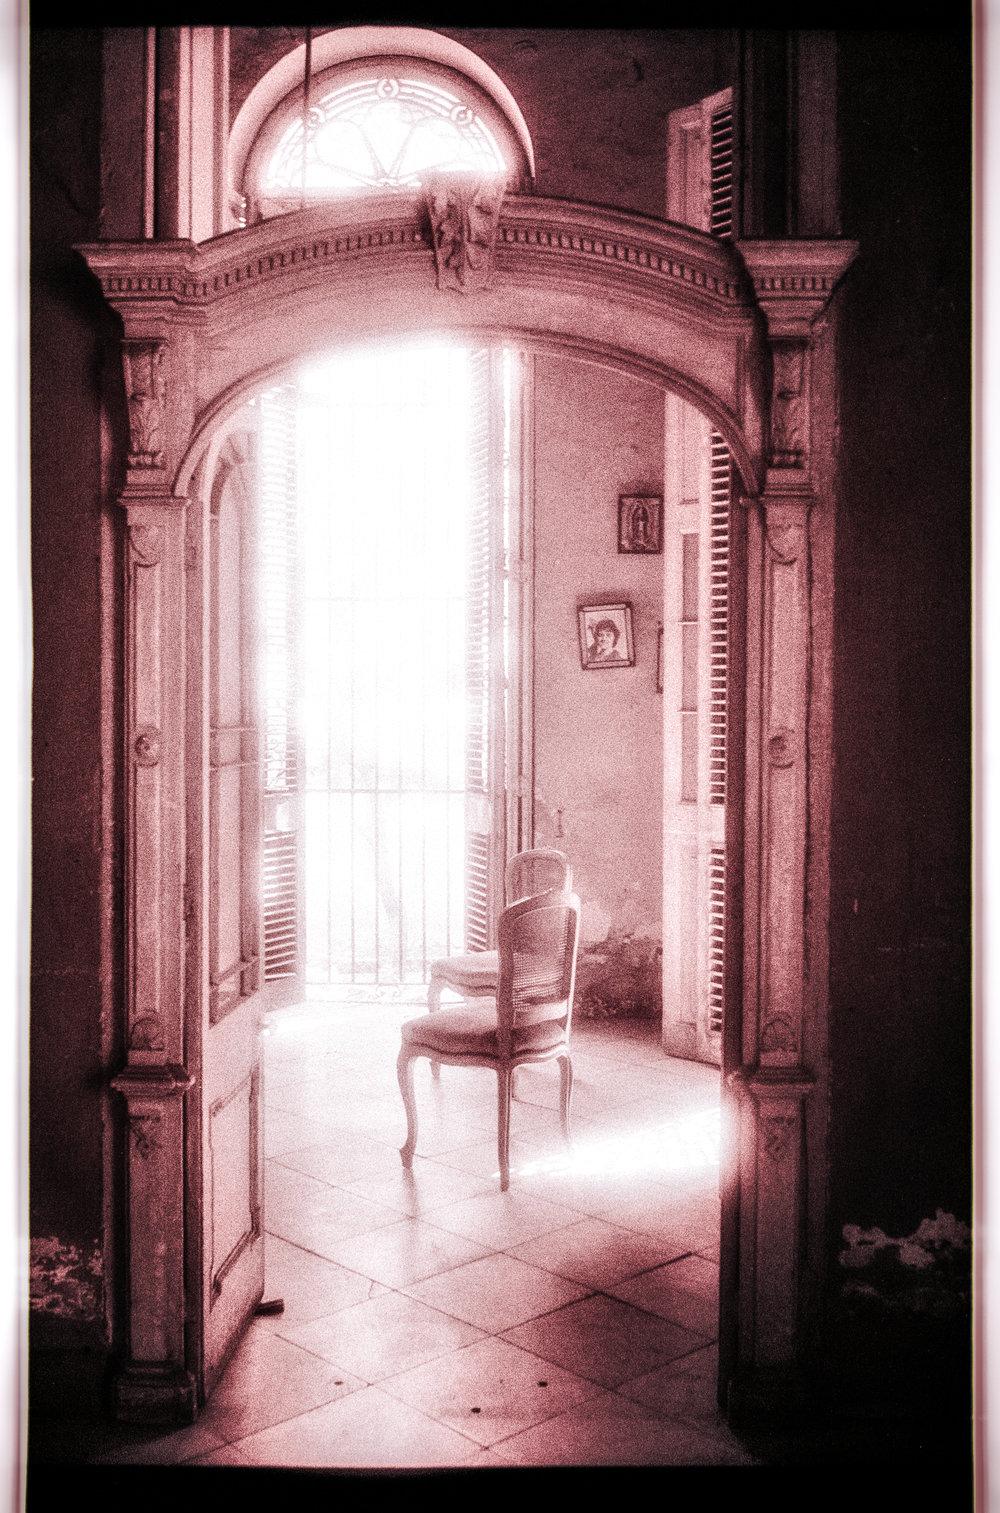 Siesta_Cuba-03.jpg